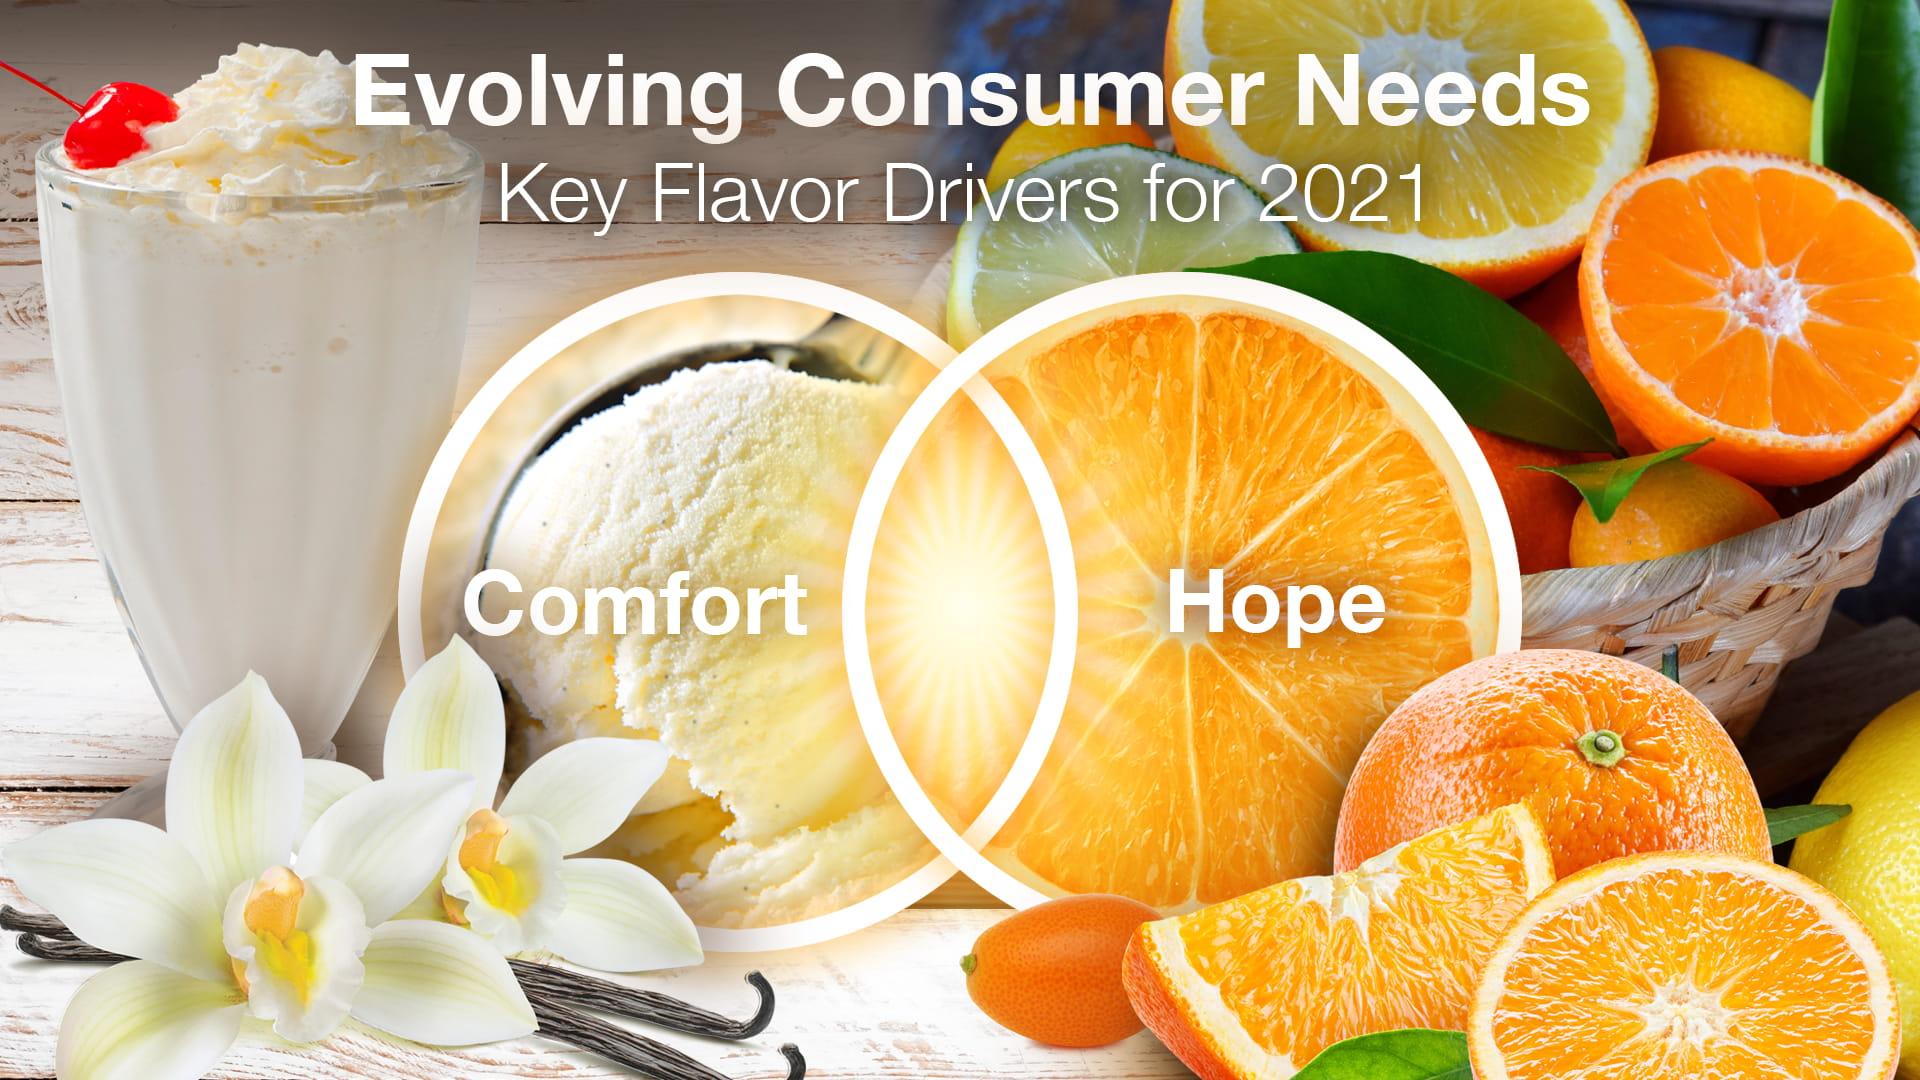 Evolving Consumer Needs Updated 01 28 21 (1)